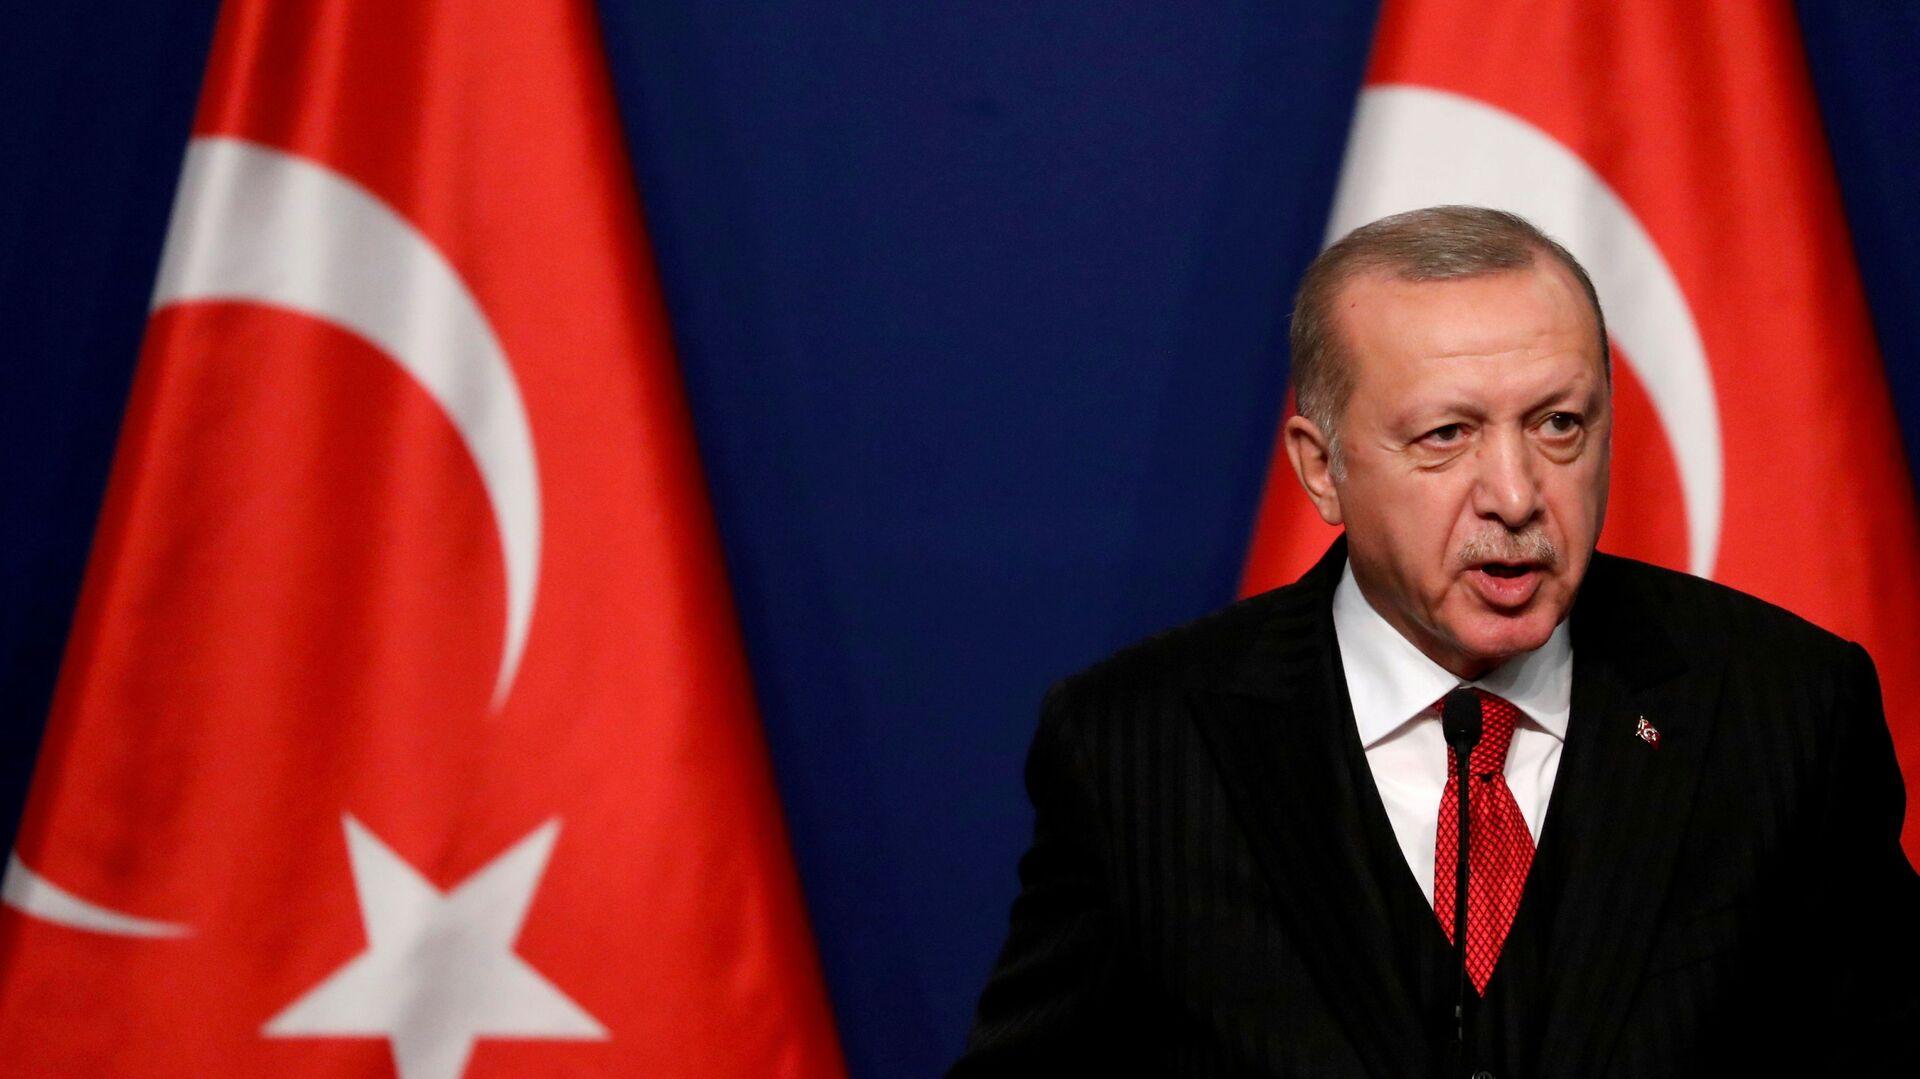 Prezydent Turcji Recep Tayyip Erdogan. - Sputnik Polska, 1920, 16.06.2021